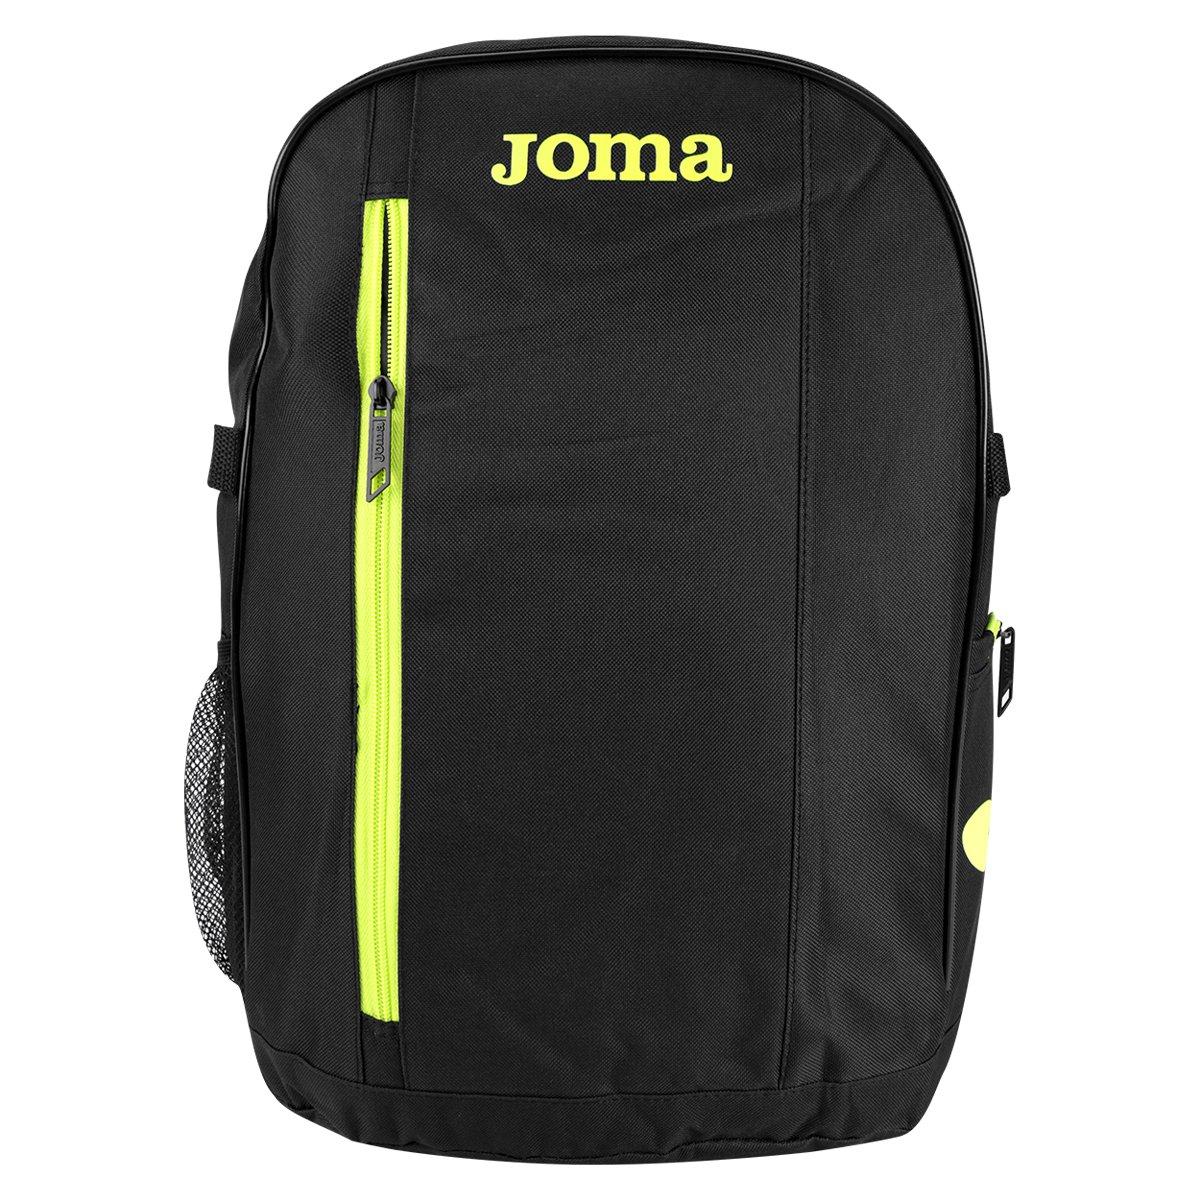 9de1218cb53 Mochila Joma - Compre Agora